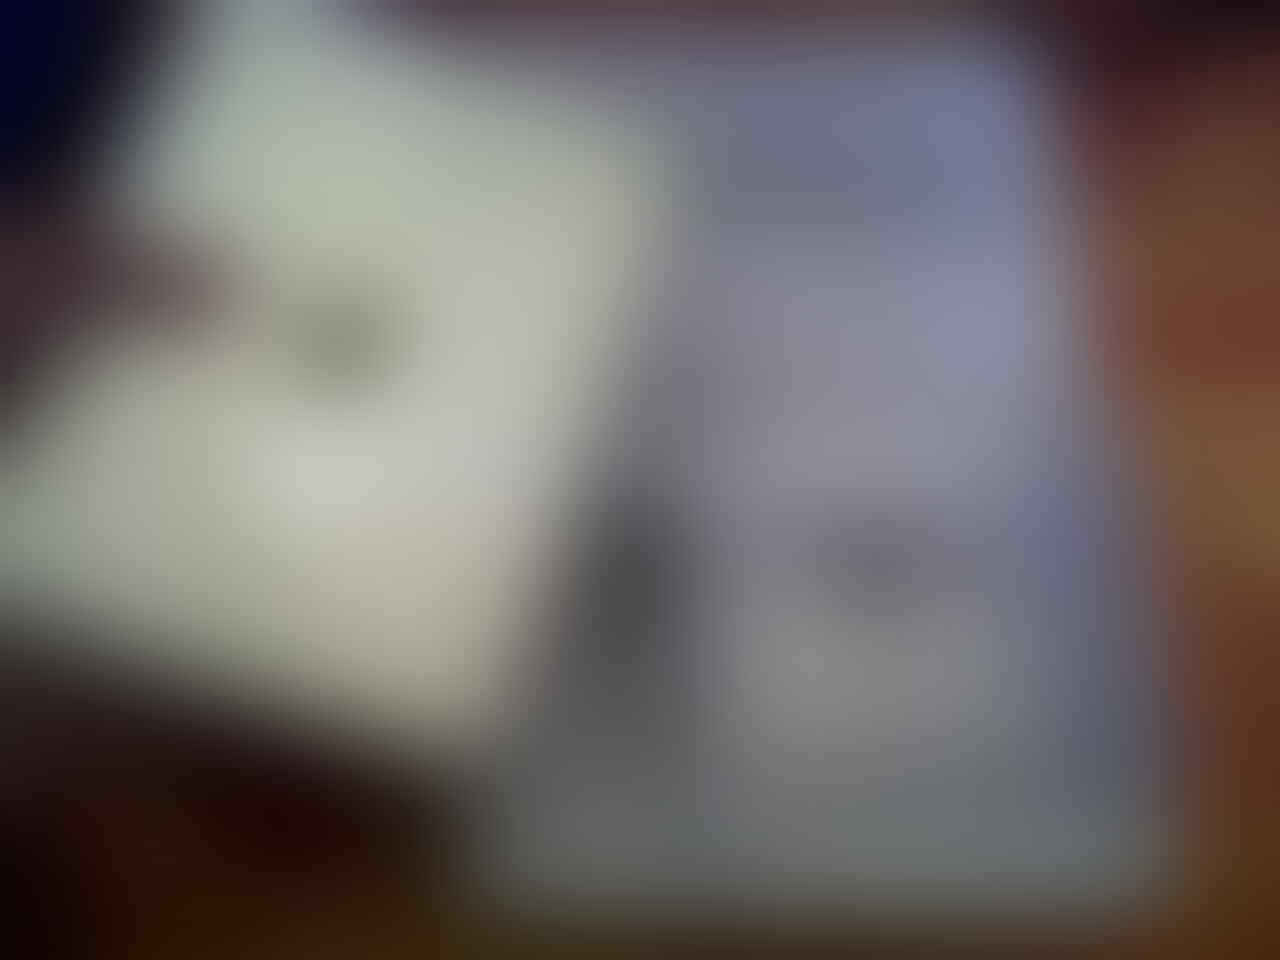 IPAD3 WIFI 16GB COLOR WHITE kondisi mulus banget LIKE NEW...